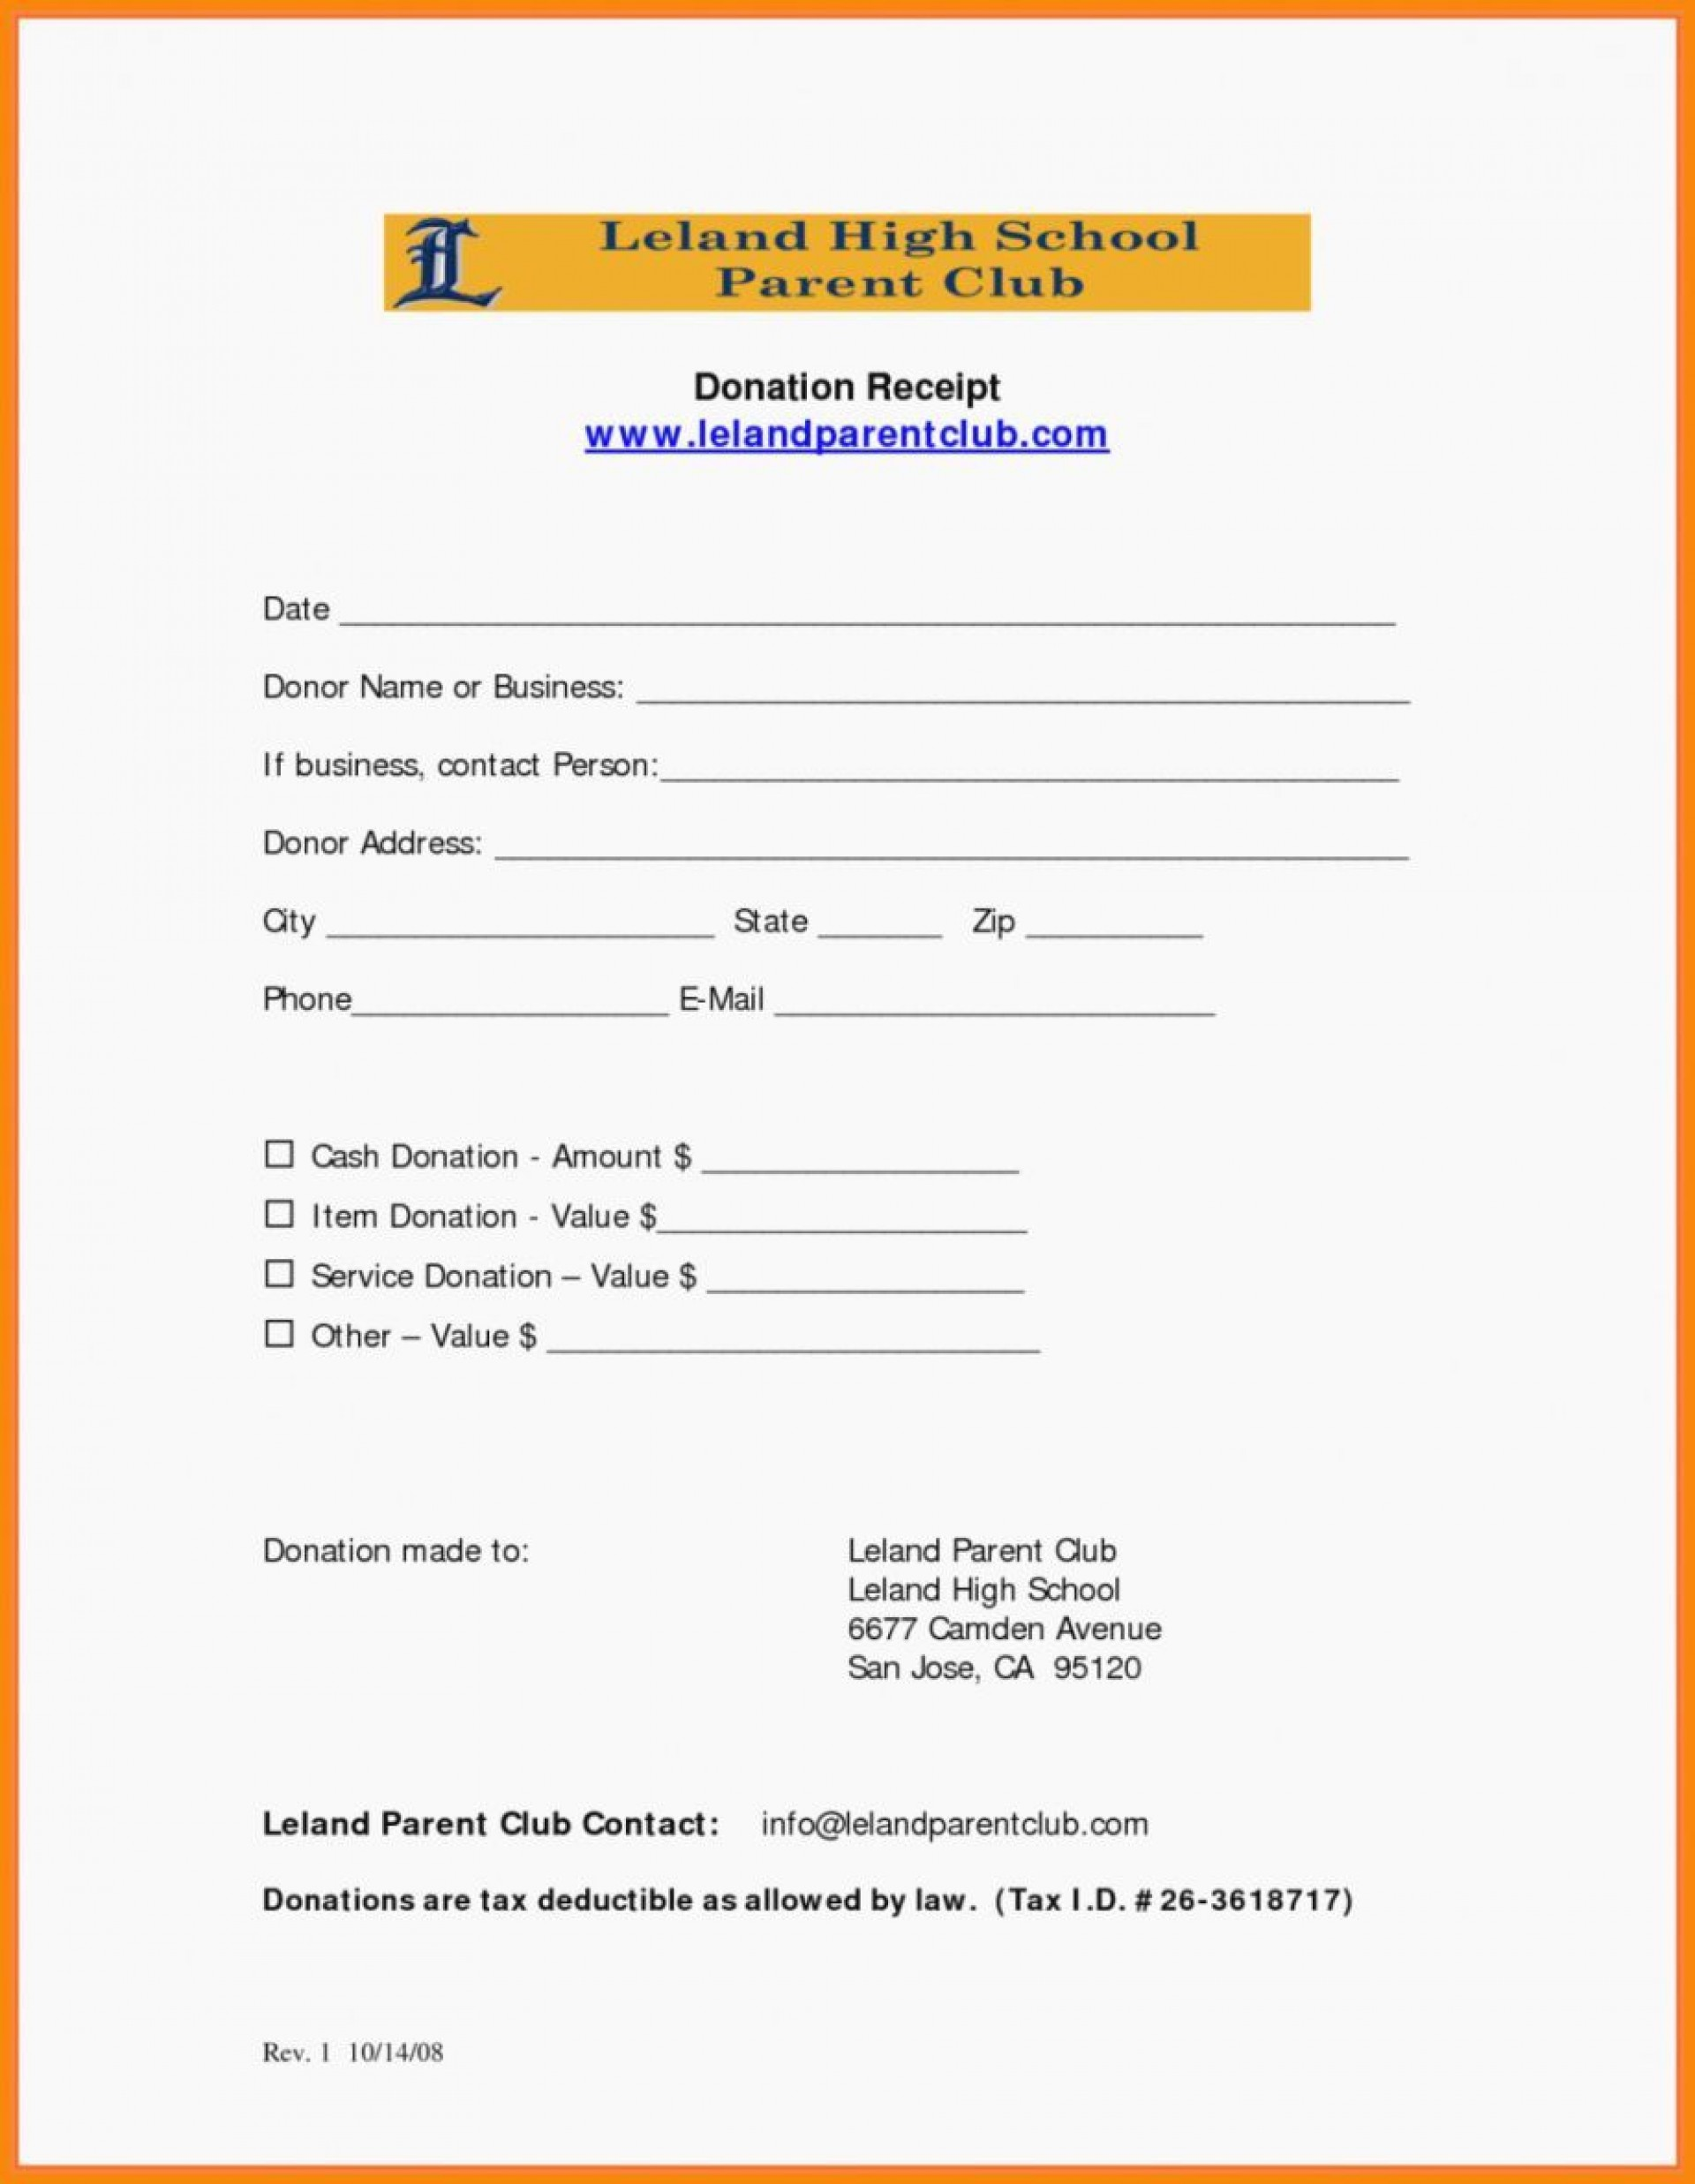 001 Beautiful Tax Deductible Donation Receipt Printable High Resolution 1920